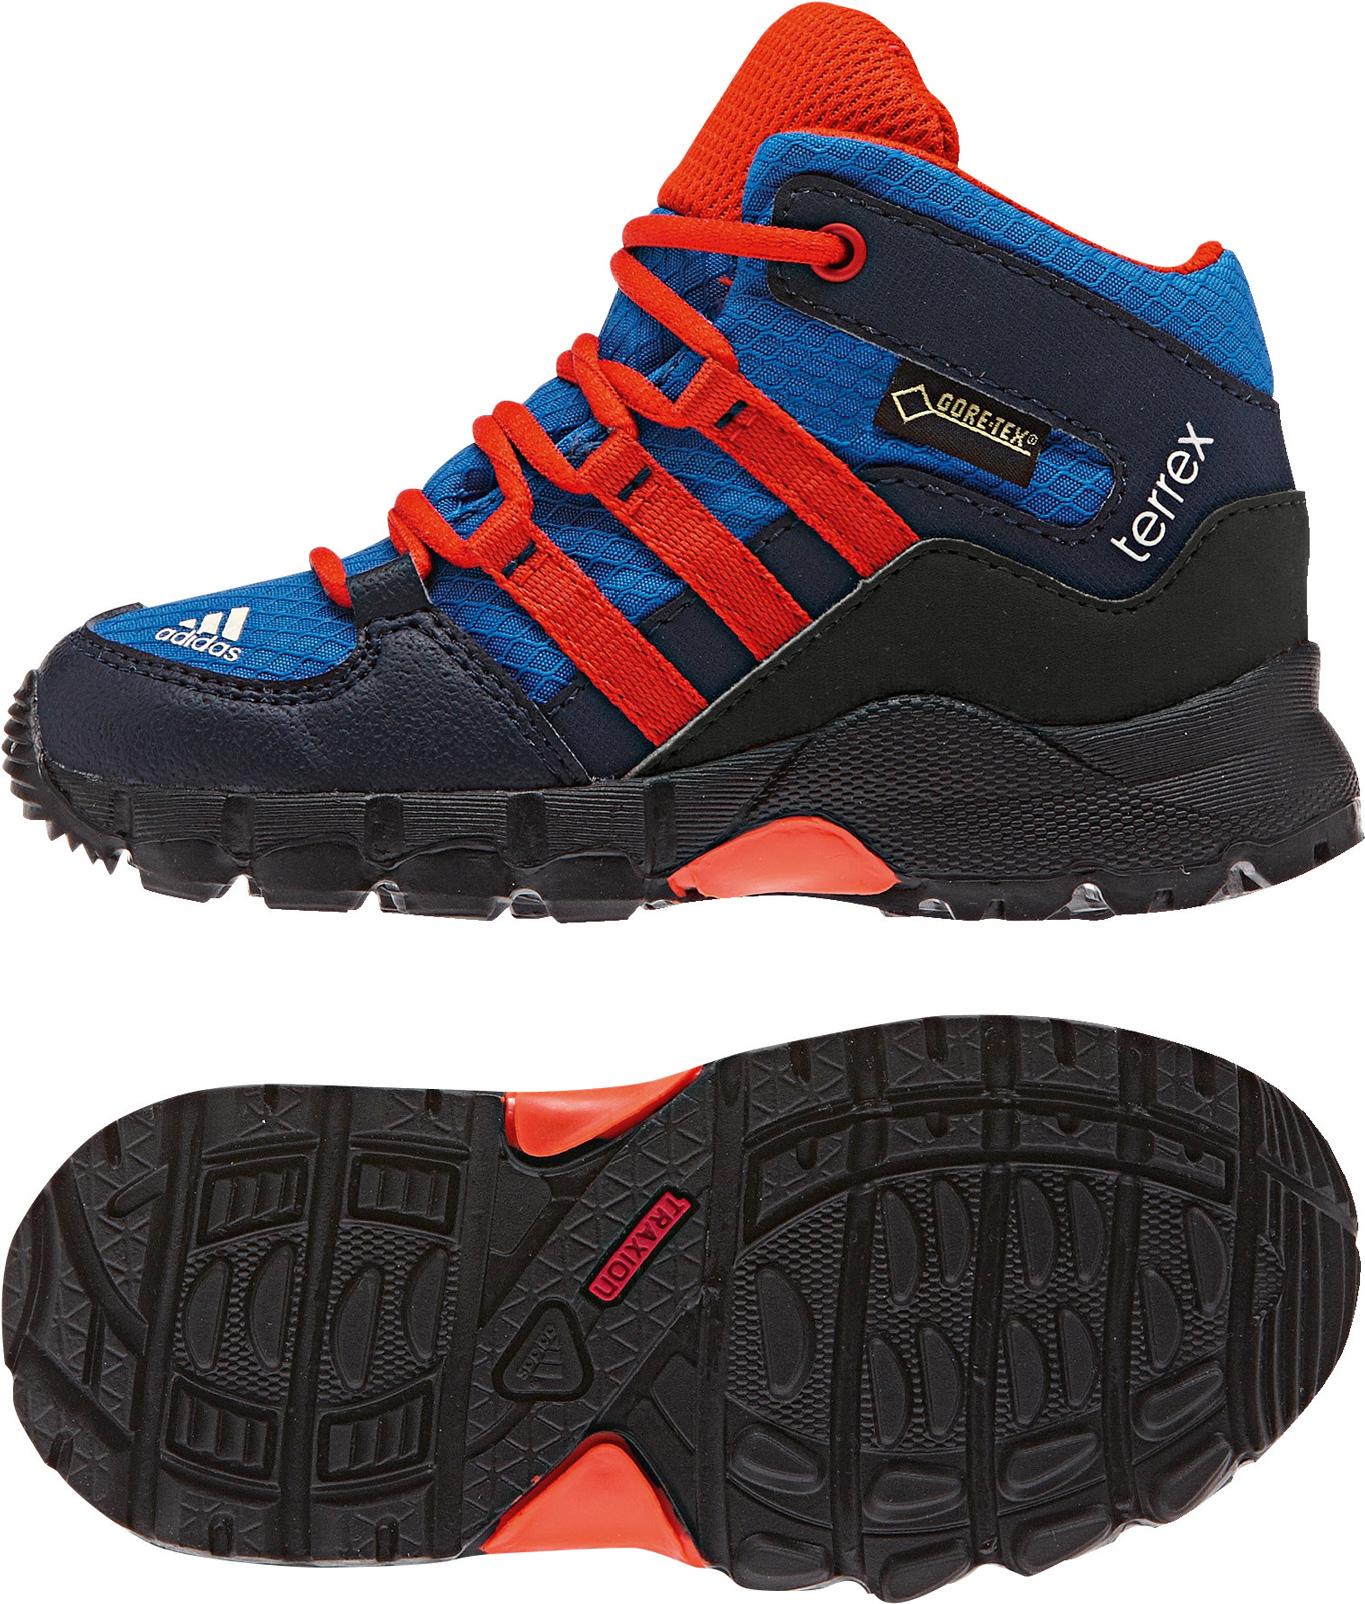 Kinder Schuhe Terrex Mid GTX I, BROYAL/CBLACK/BORANG, 20